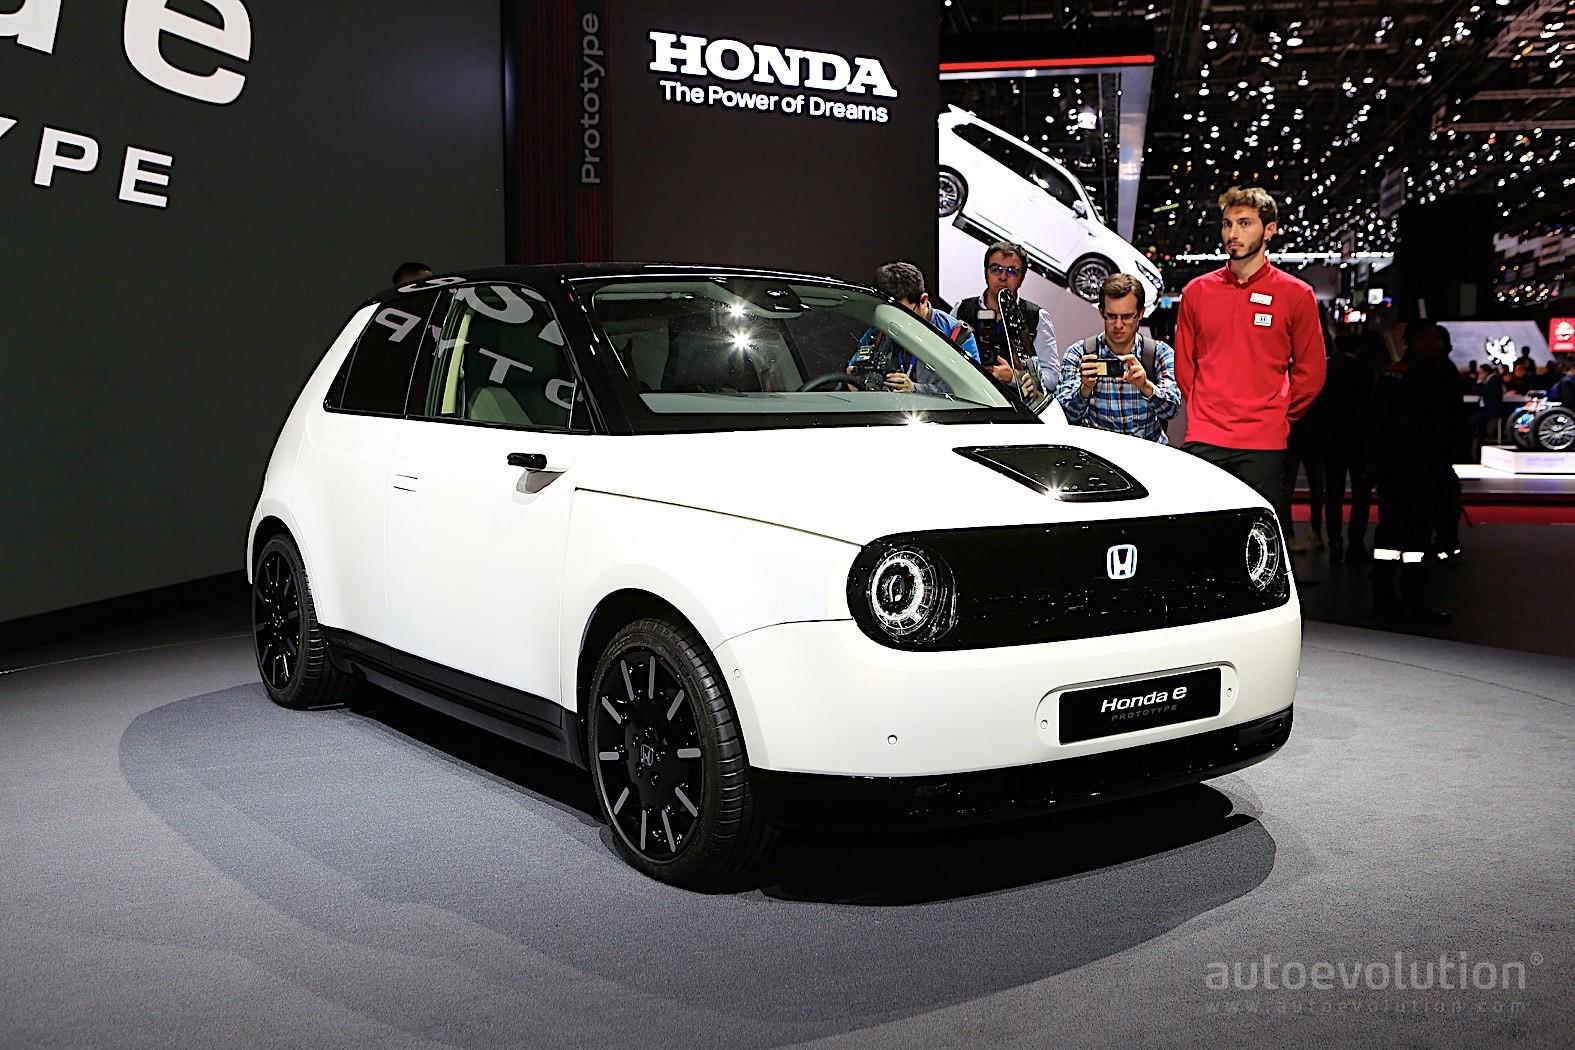 Honda E Prototype Shows Funky Interior in Geneva - autoevolution